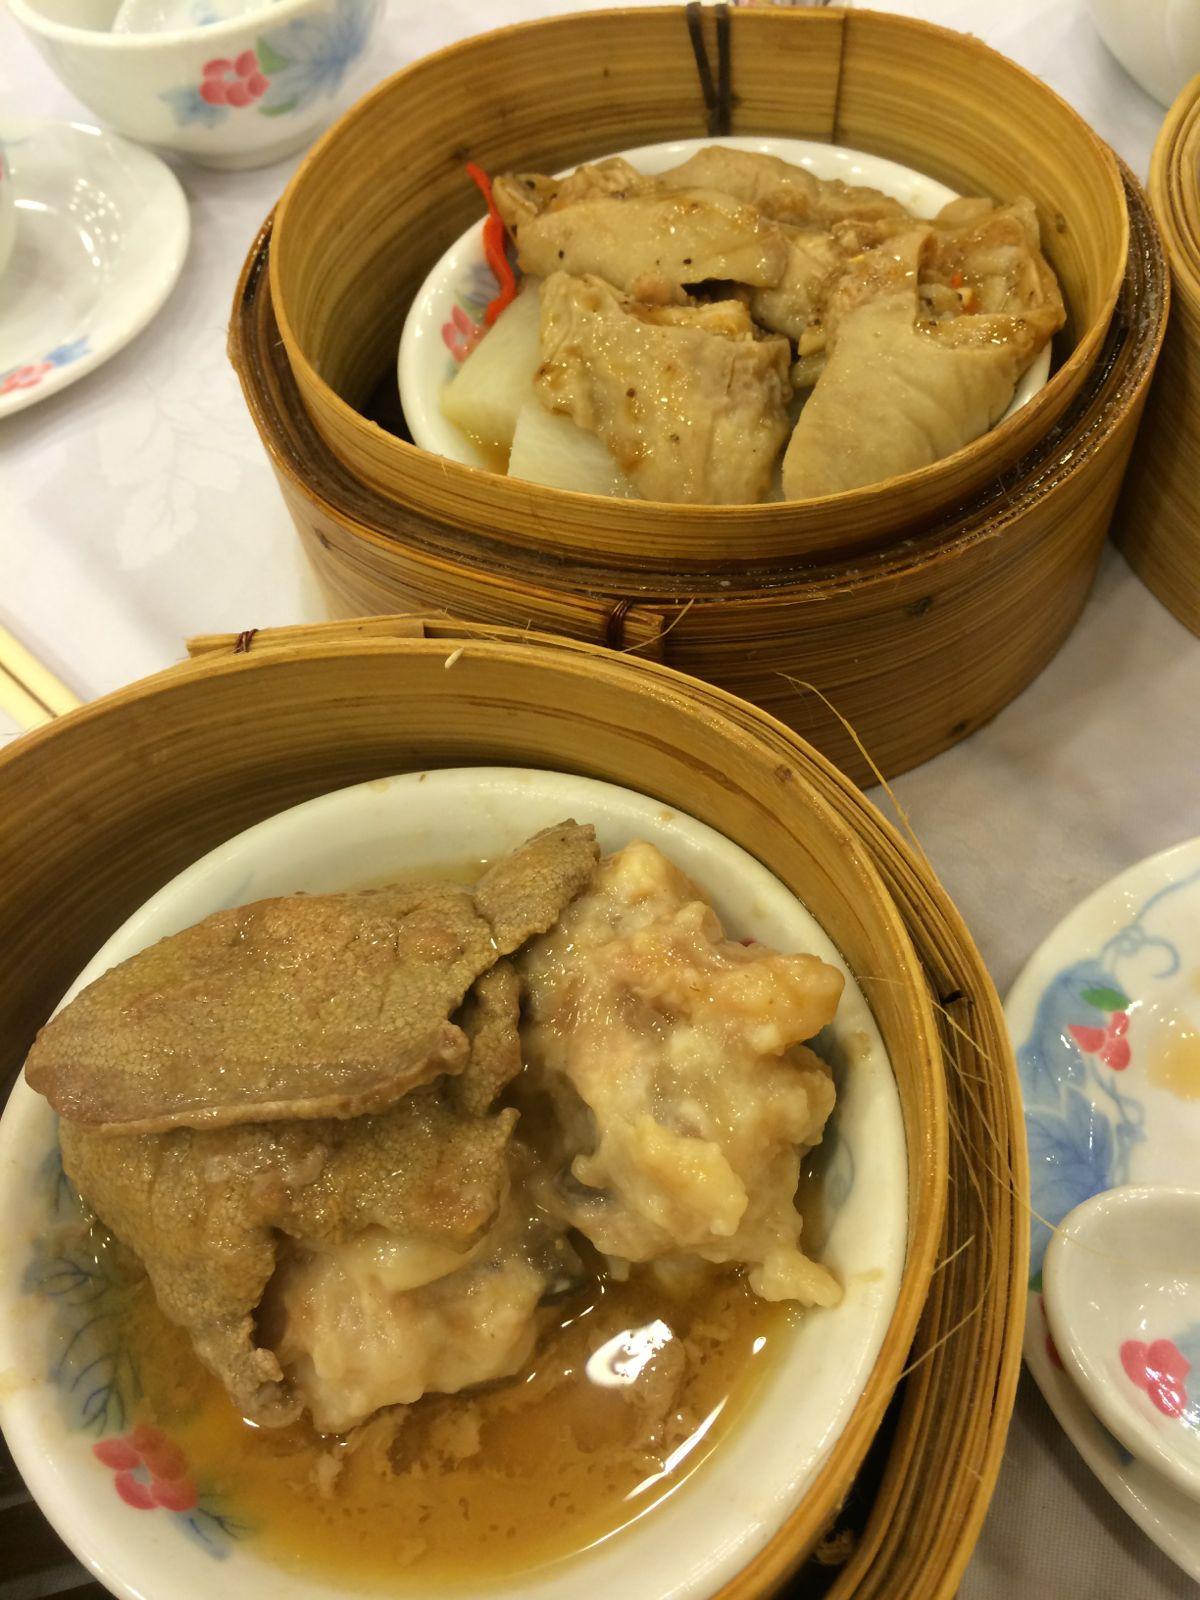 ** -Private blog- **: 香港ぶらぶら6th-3 太子 鳳城酒家 Fung Shing Restaurant 7/11